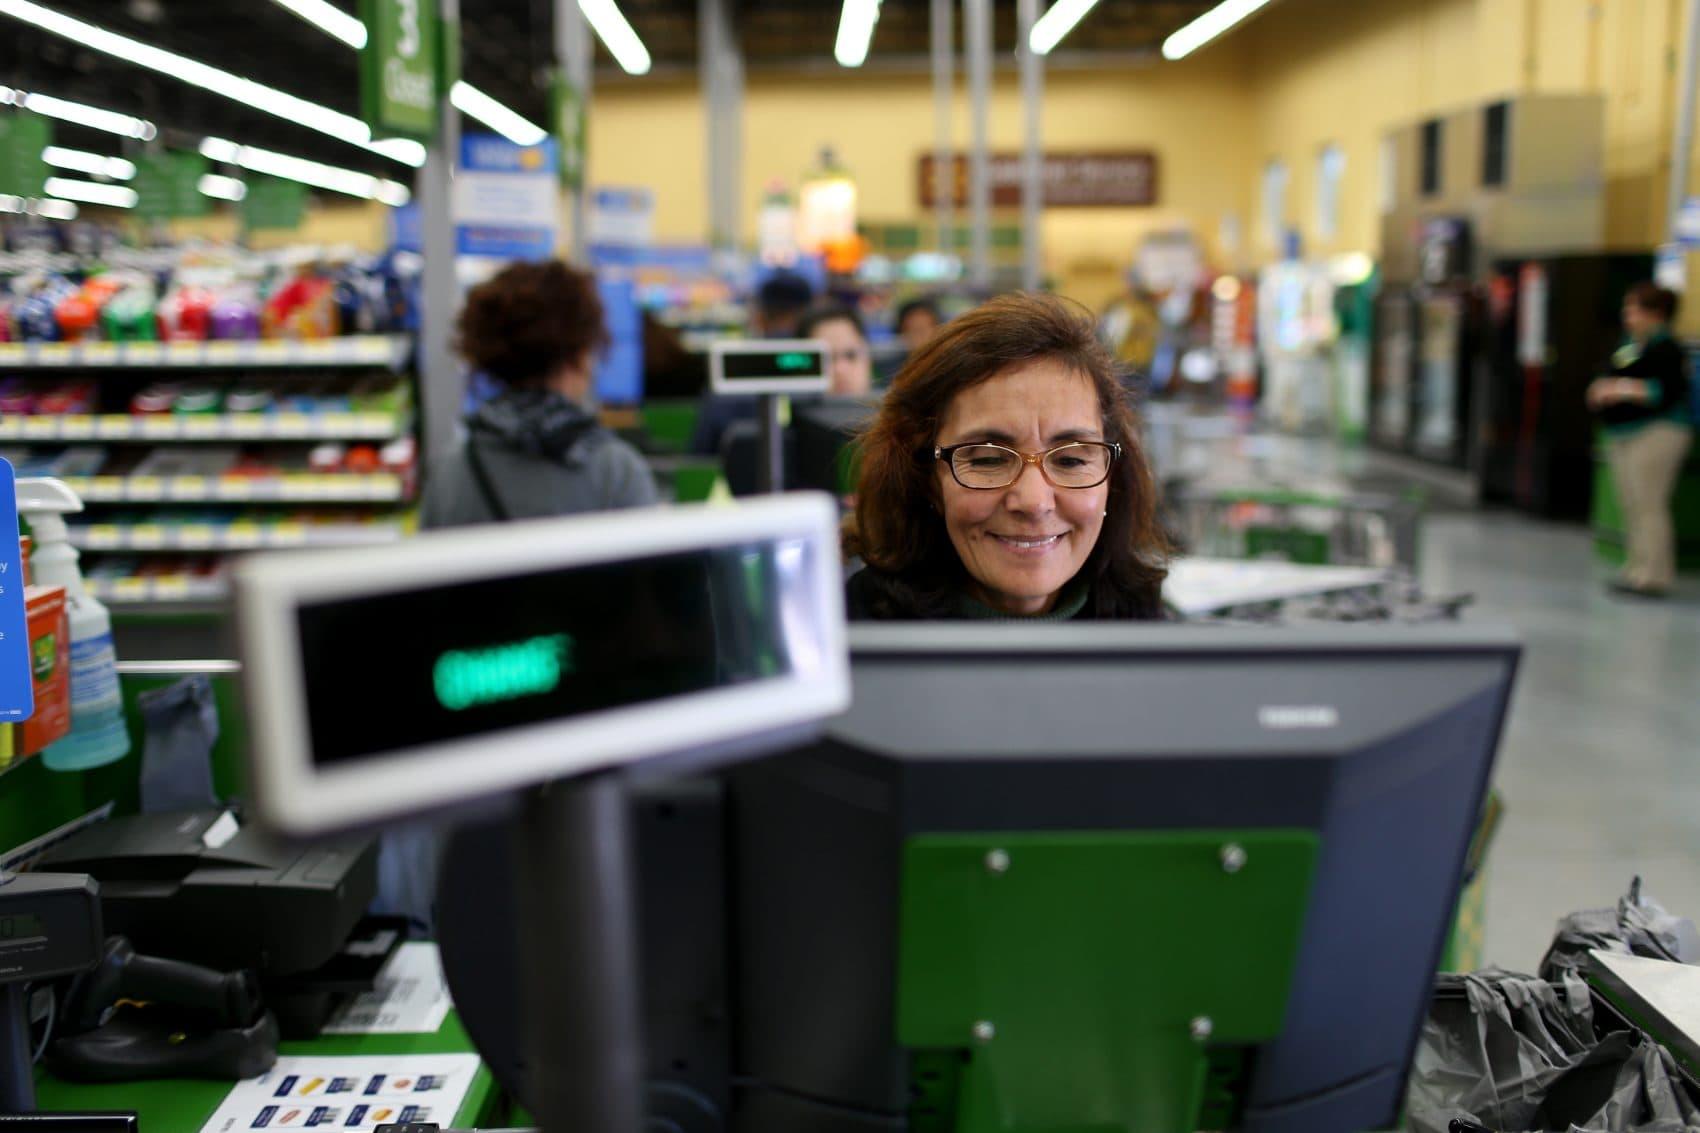 Is walmart cashier training stressful?